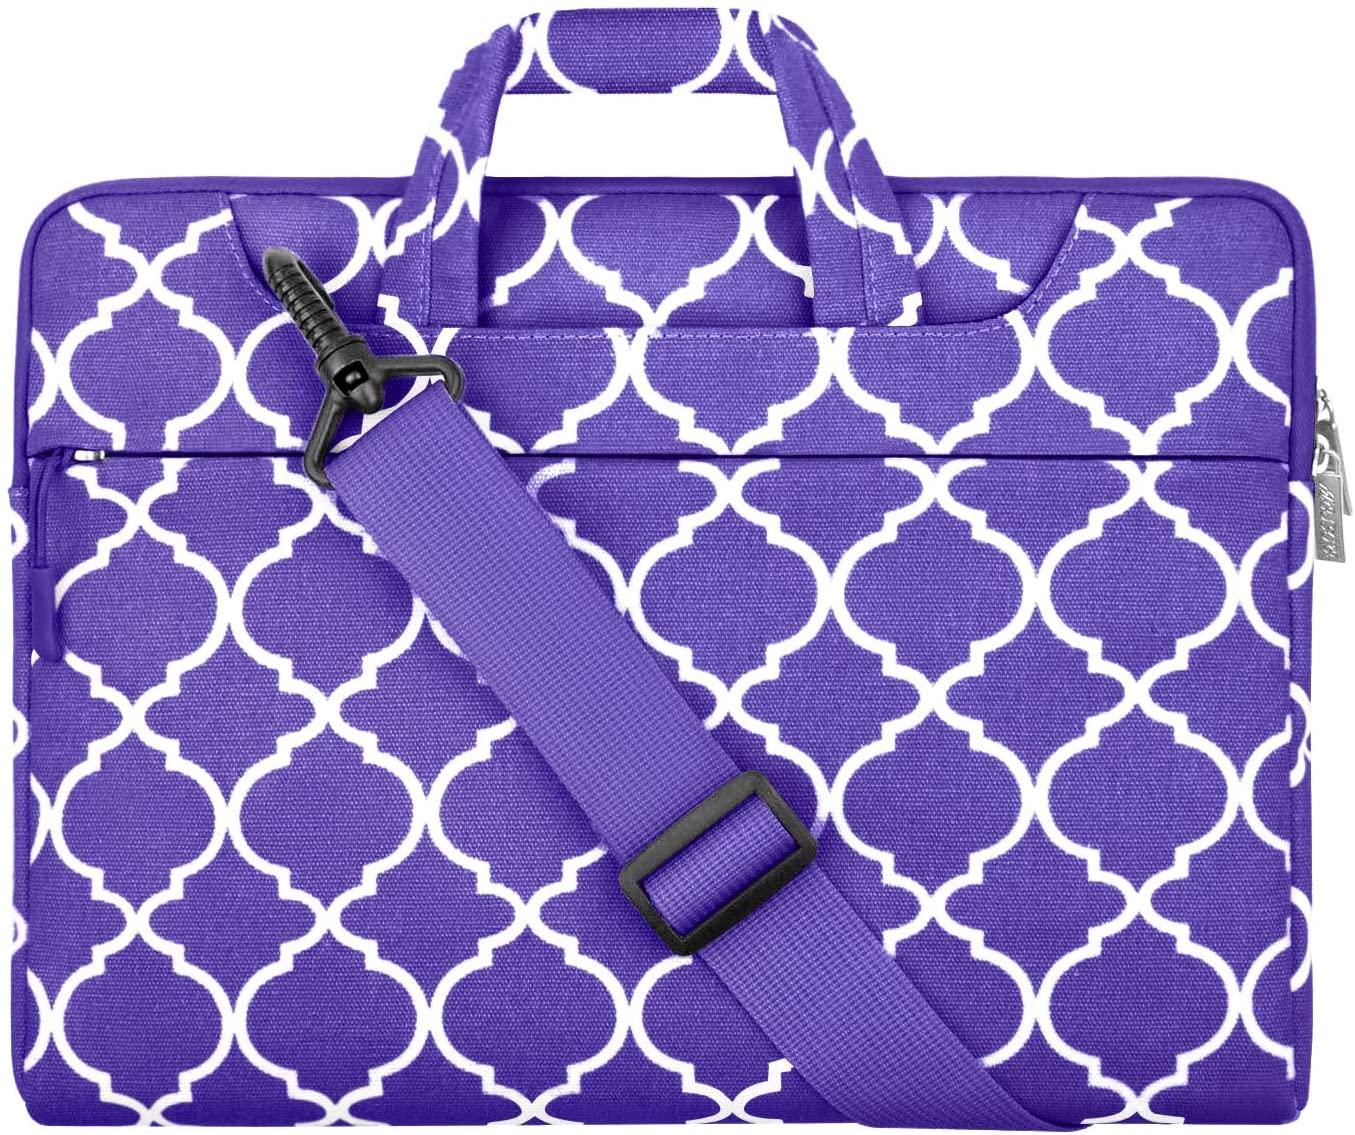 MOSISO Laptop Shoulder Bag Compatible with 13-13.3 inch MacBook Pro, MacBook Air, Notebook Computer, Canvas Quatrefoil Pattern Briefcase Sleeve Case, Ultra Violet